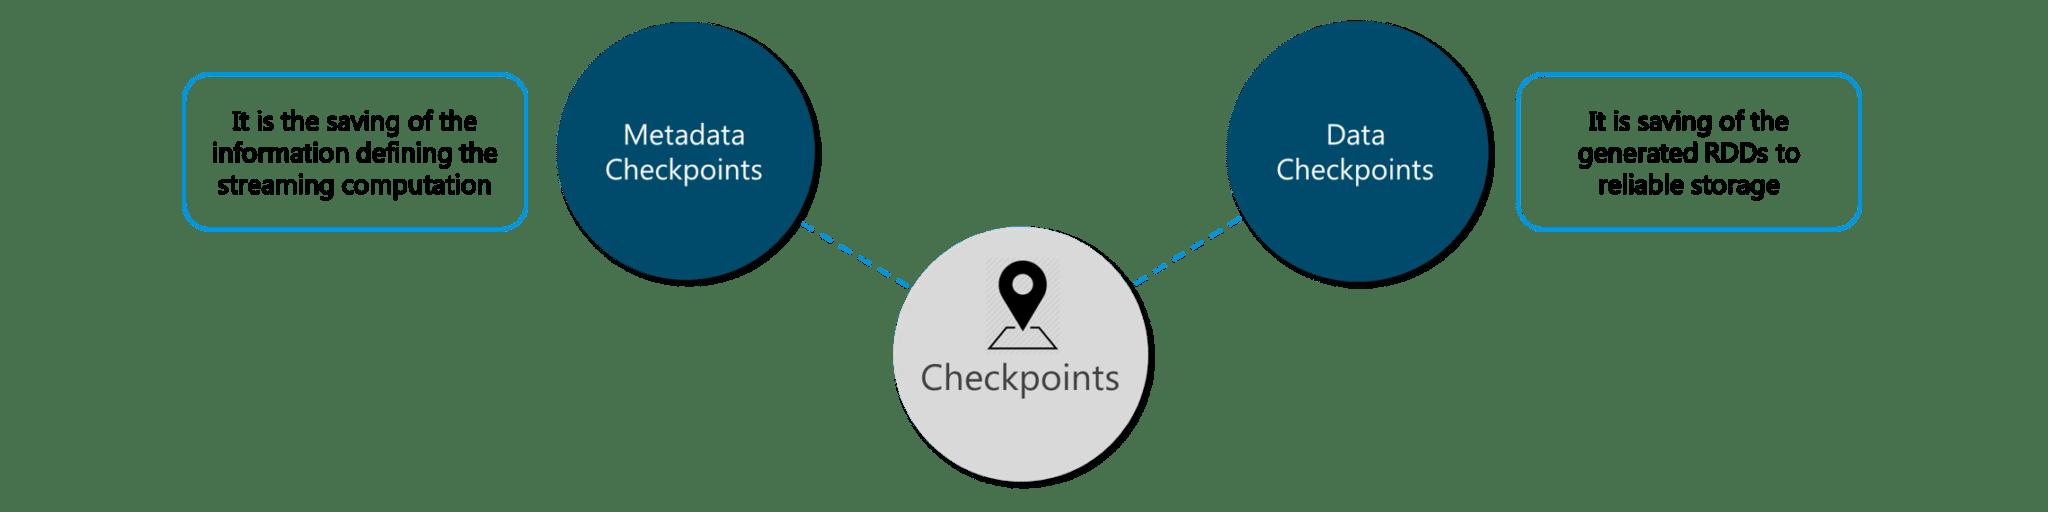 Checkpoints - Spark Streaming - Edureka